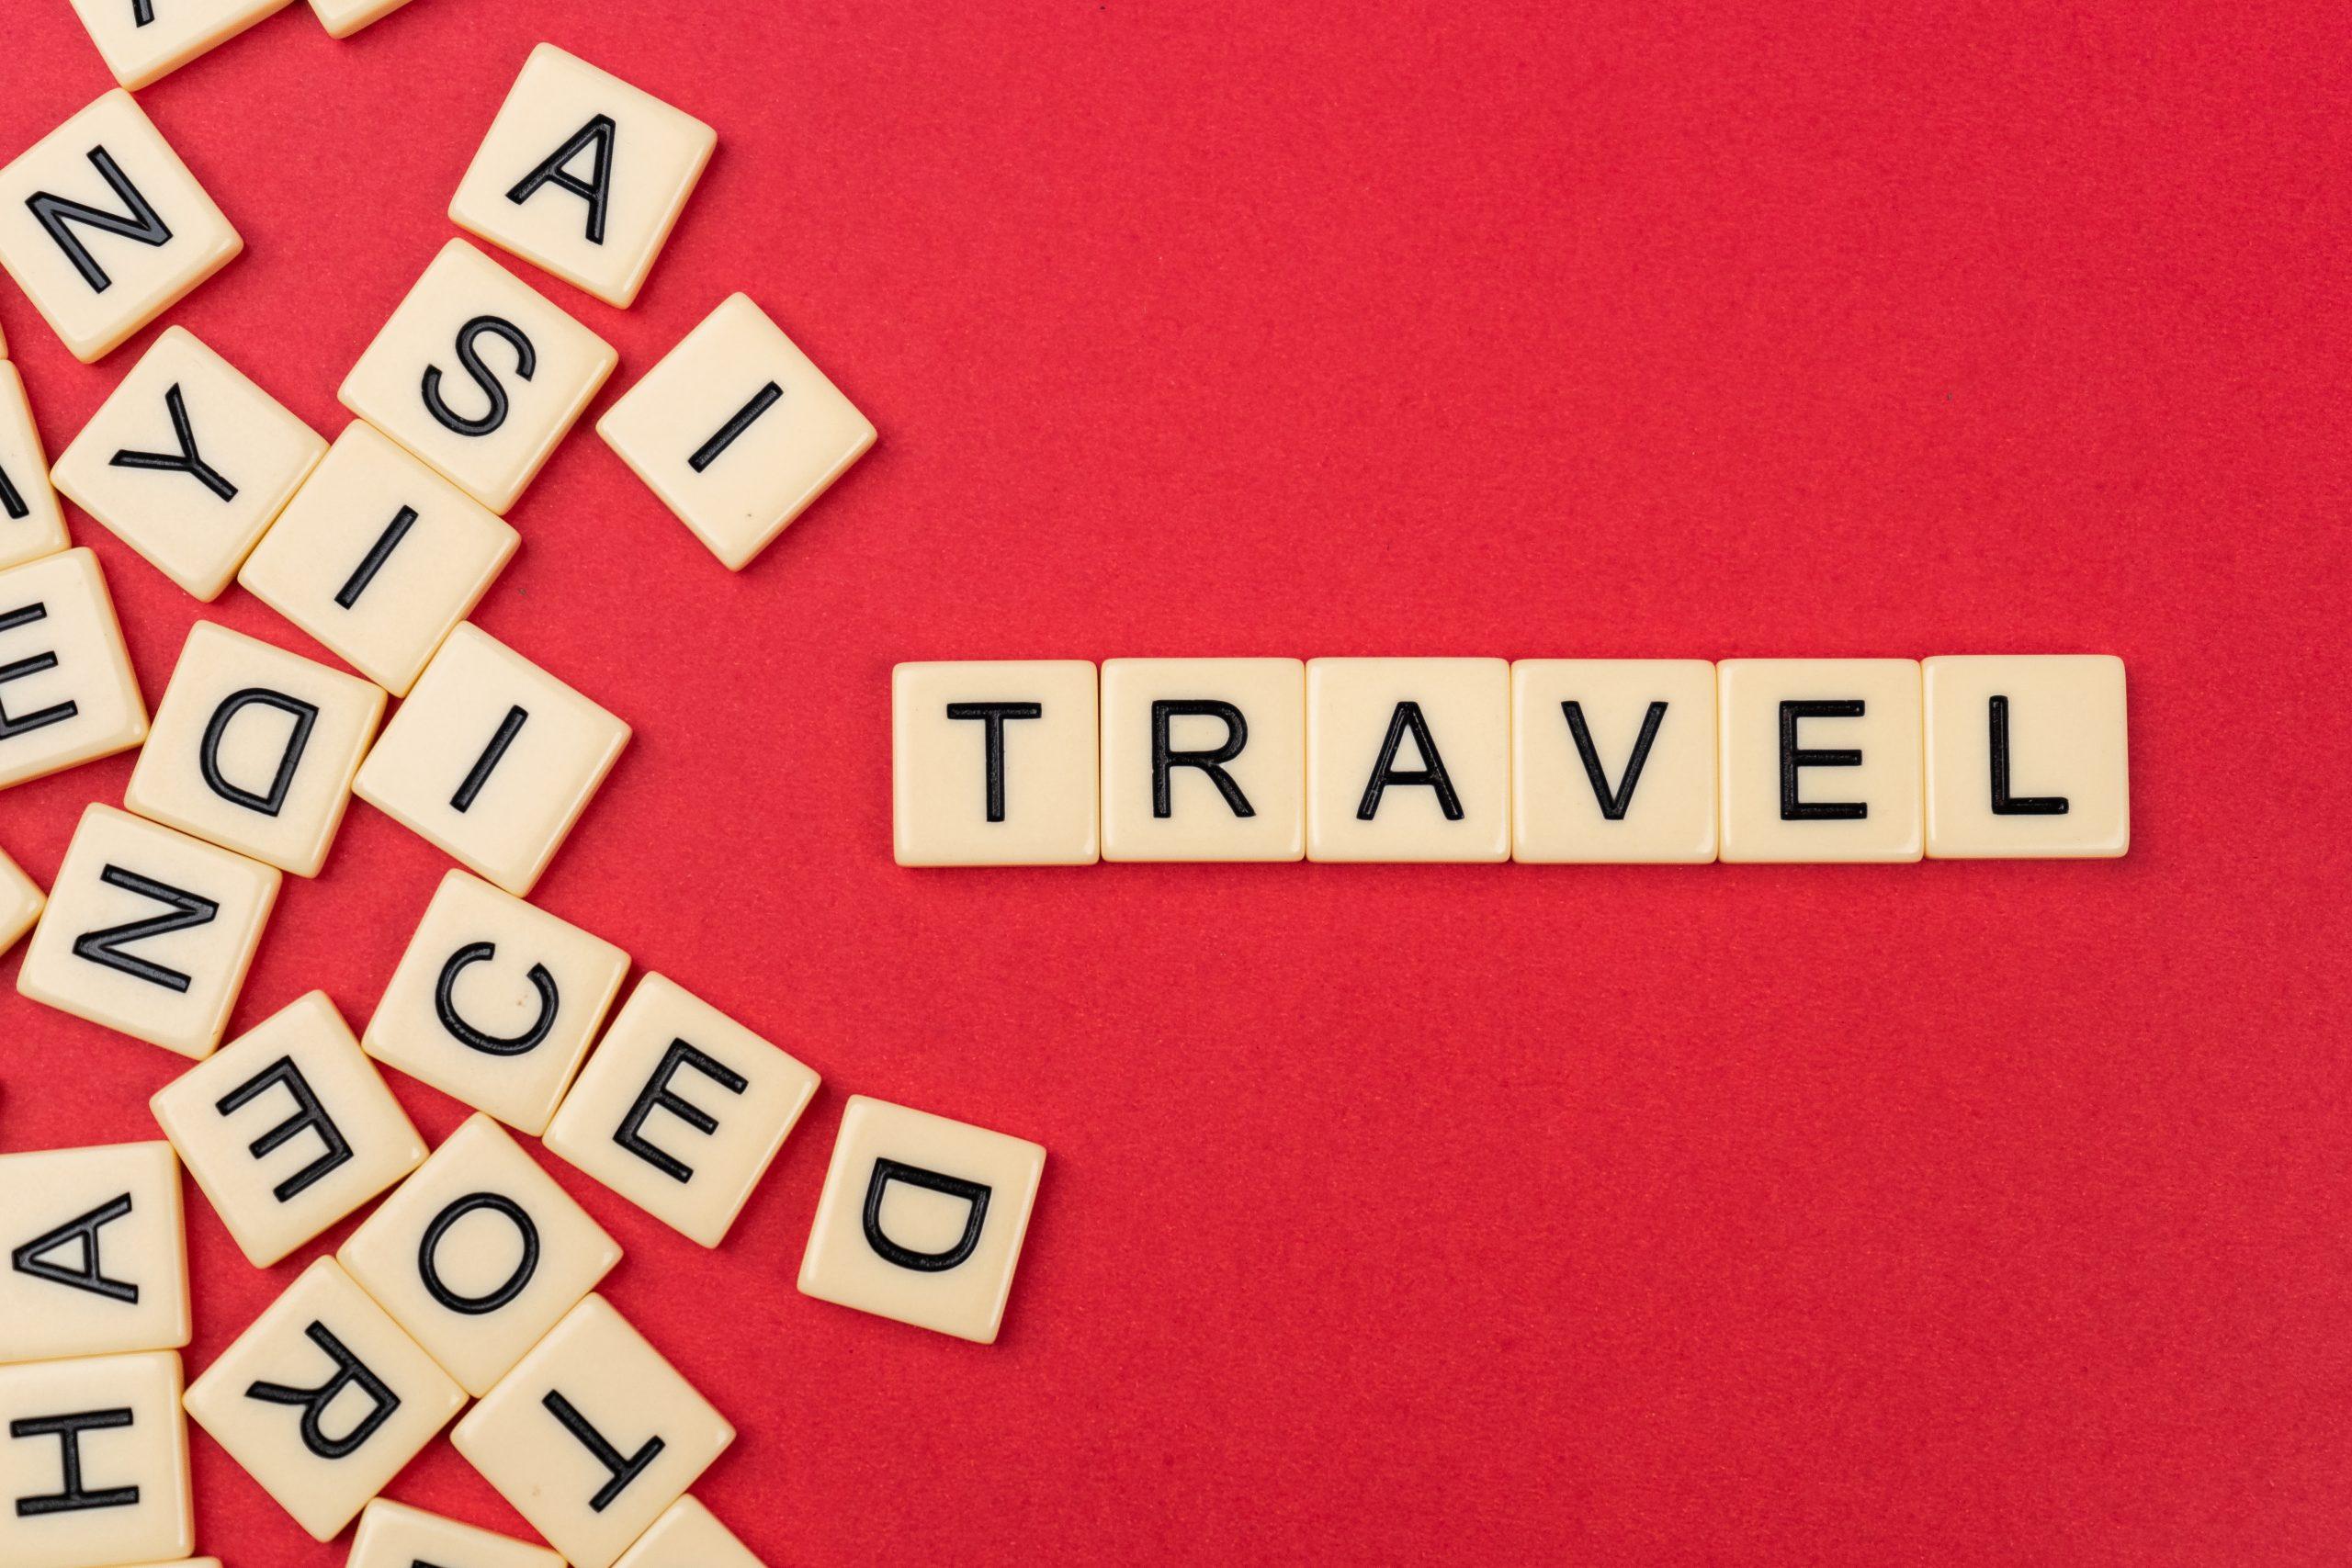 Travel written with scrabble